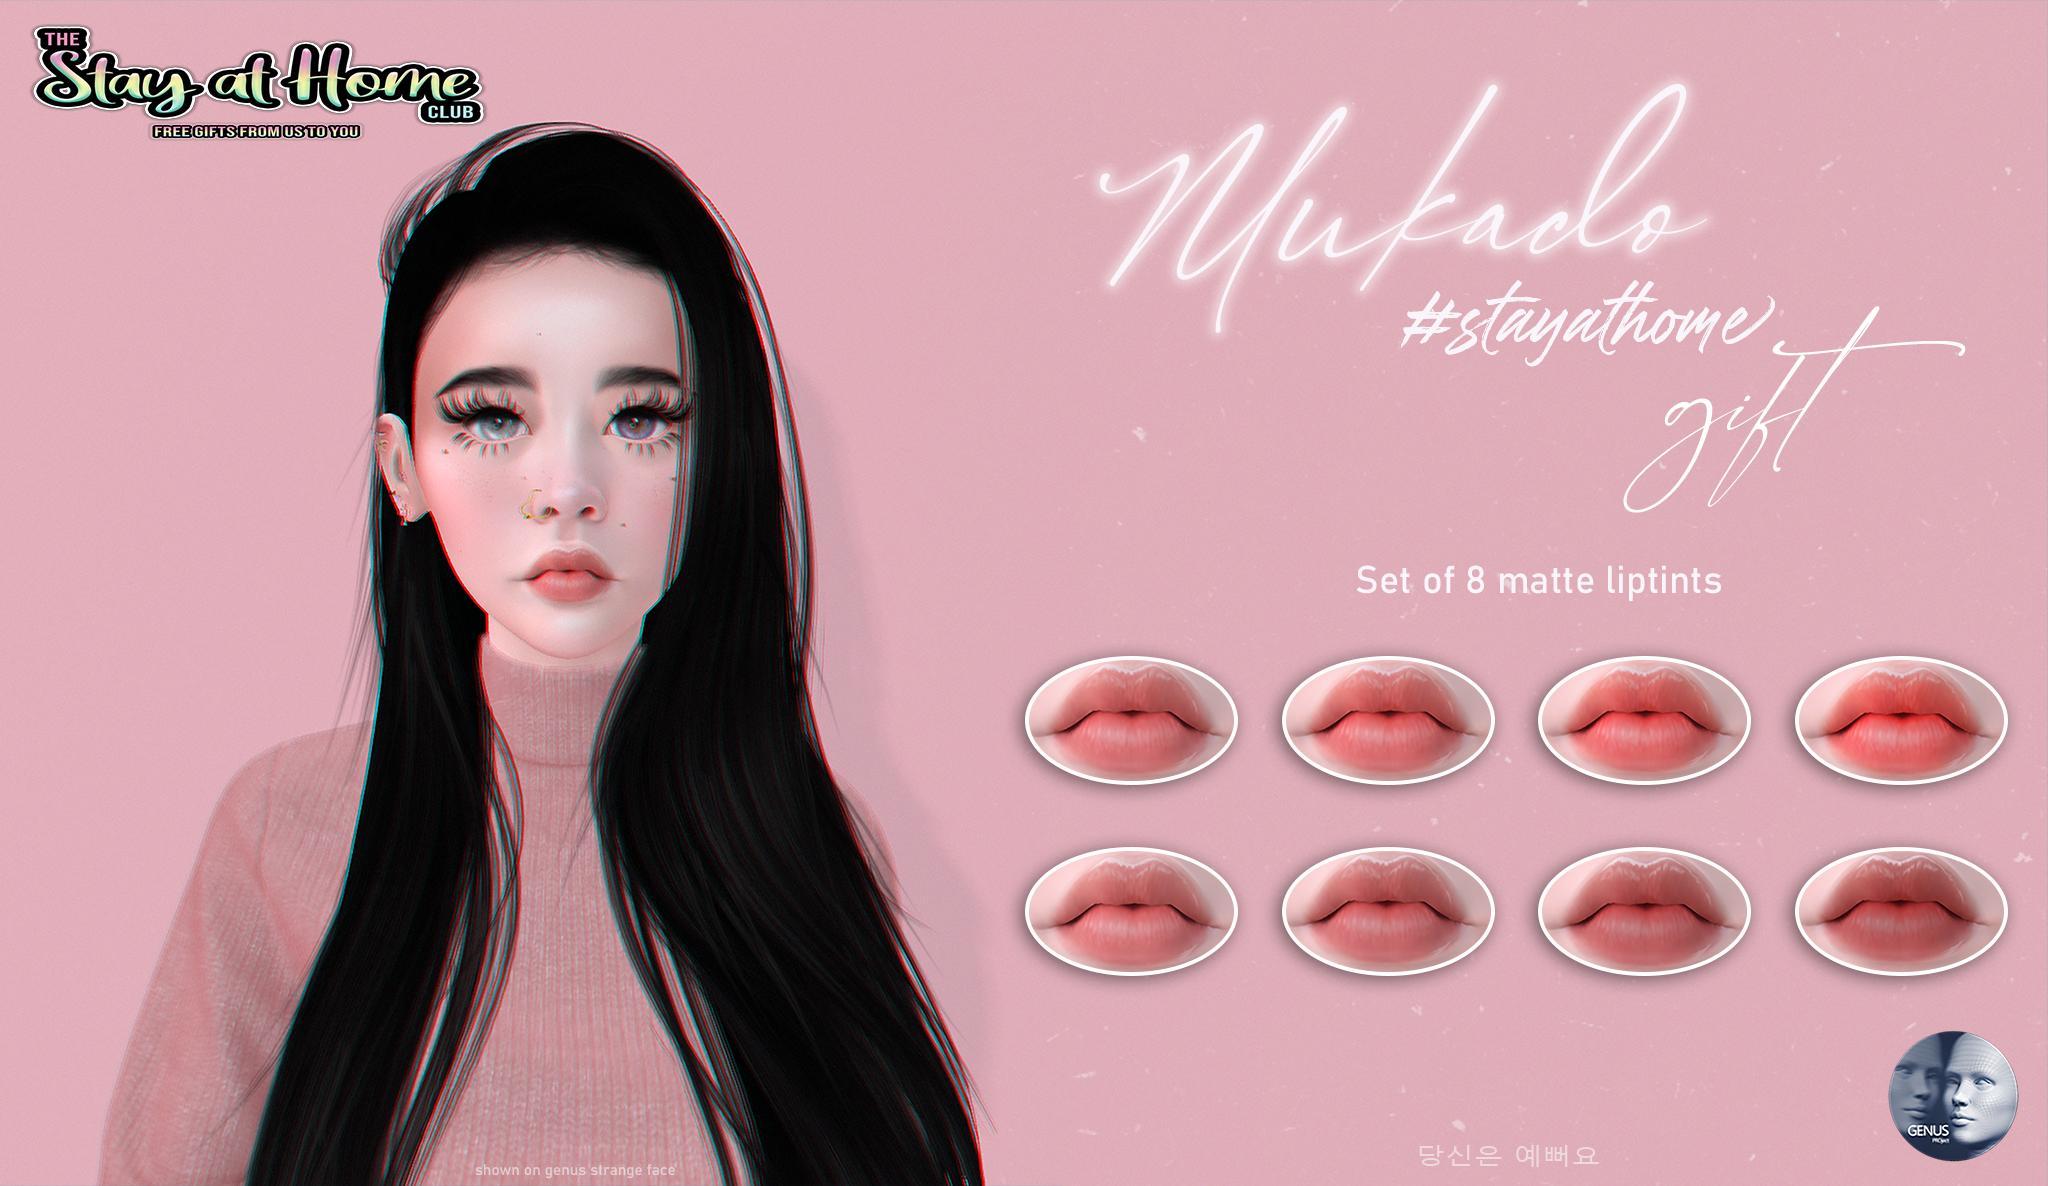 Mukado - 8 liptints gift